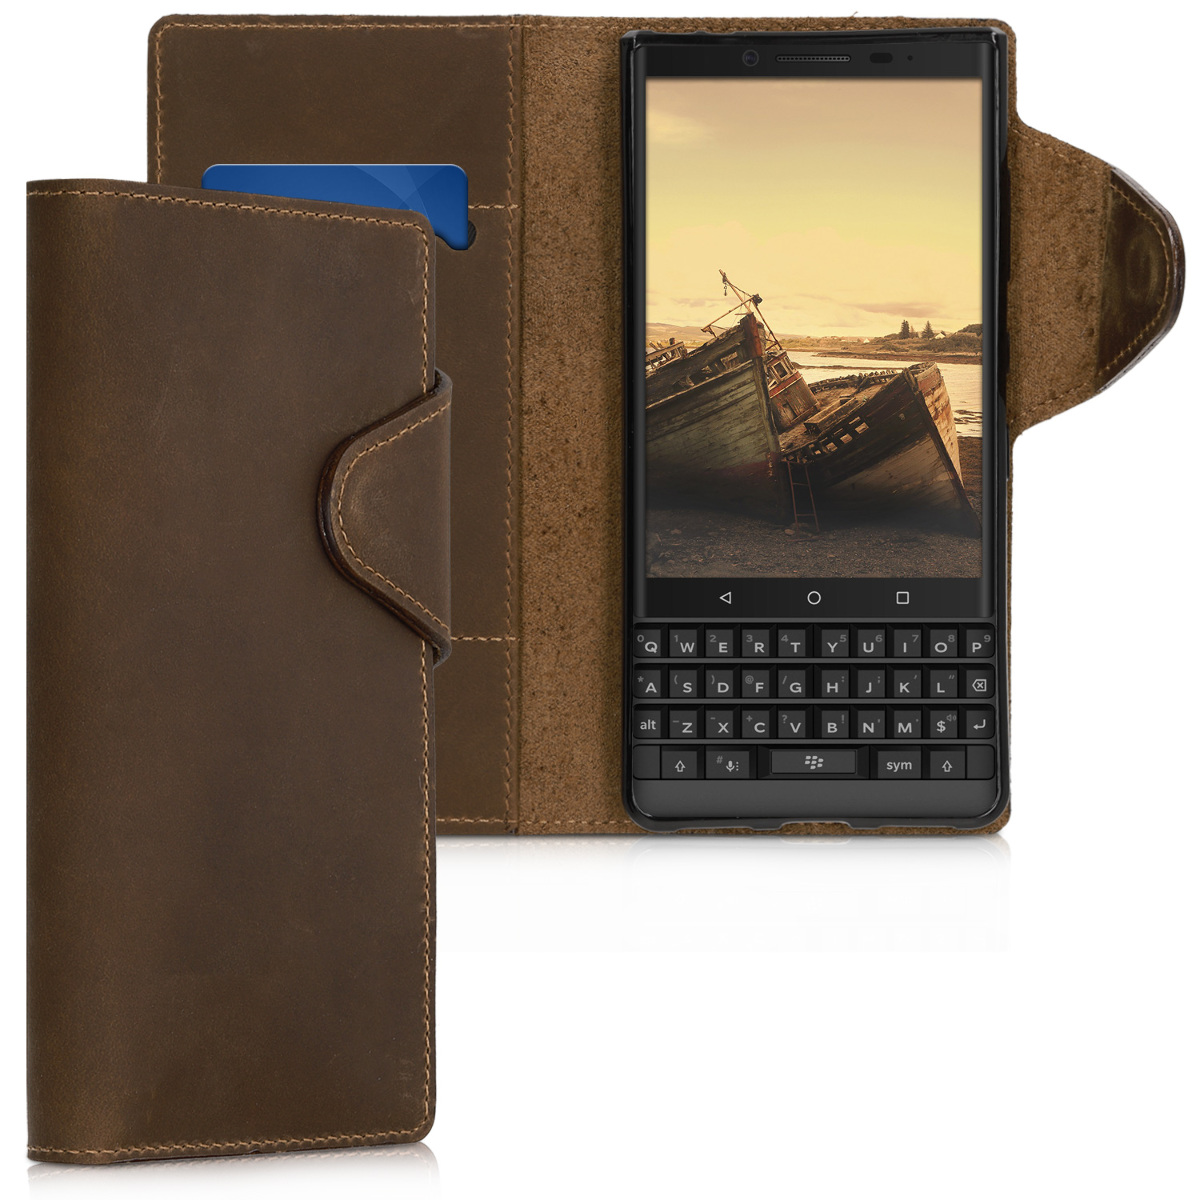 Kalibri Θήκη- Πορτοφόλι Blackberry KEY2 LE (Lite) - Αυθεντικό δέρμα - Brown (47113.05)